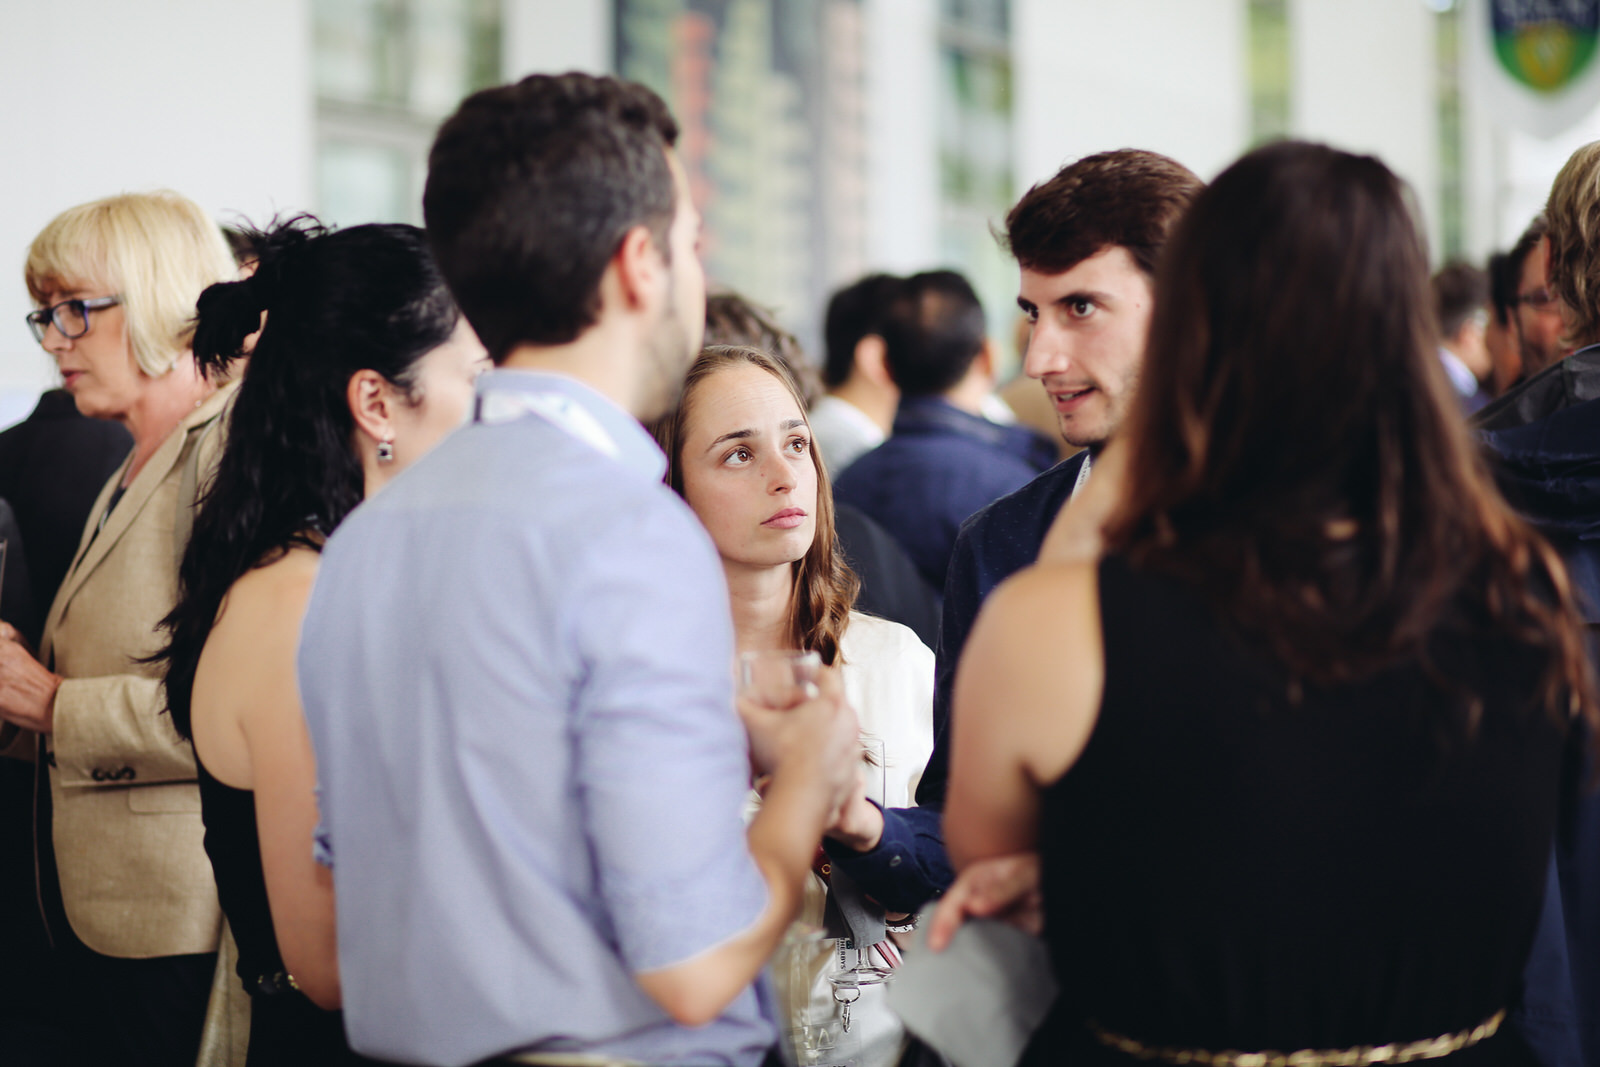 Corporate-conference-photographer-dublin-016.jpg